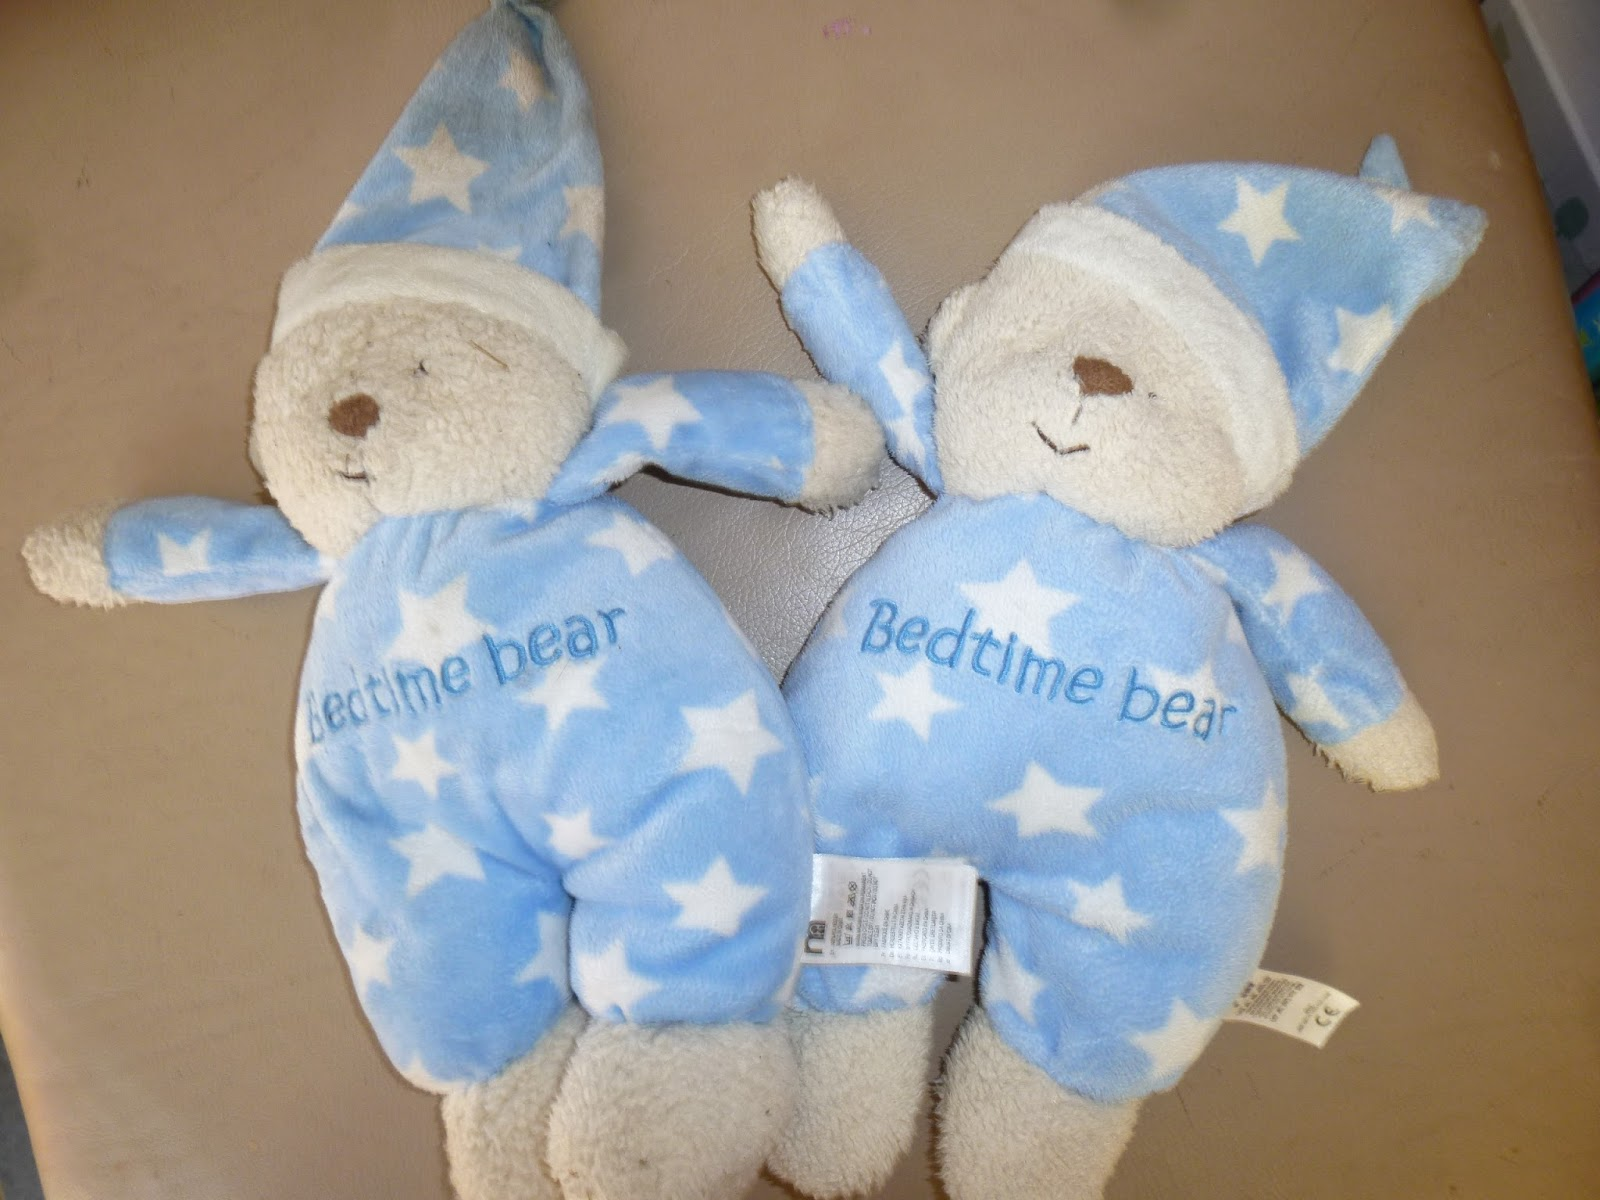 Blogging Beautifully: Say hello to 'bedtime bear'.....